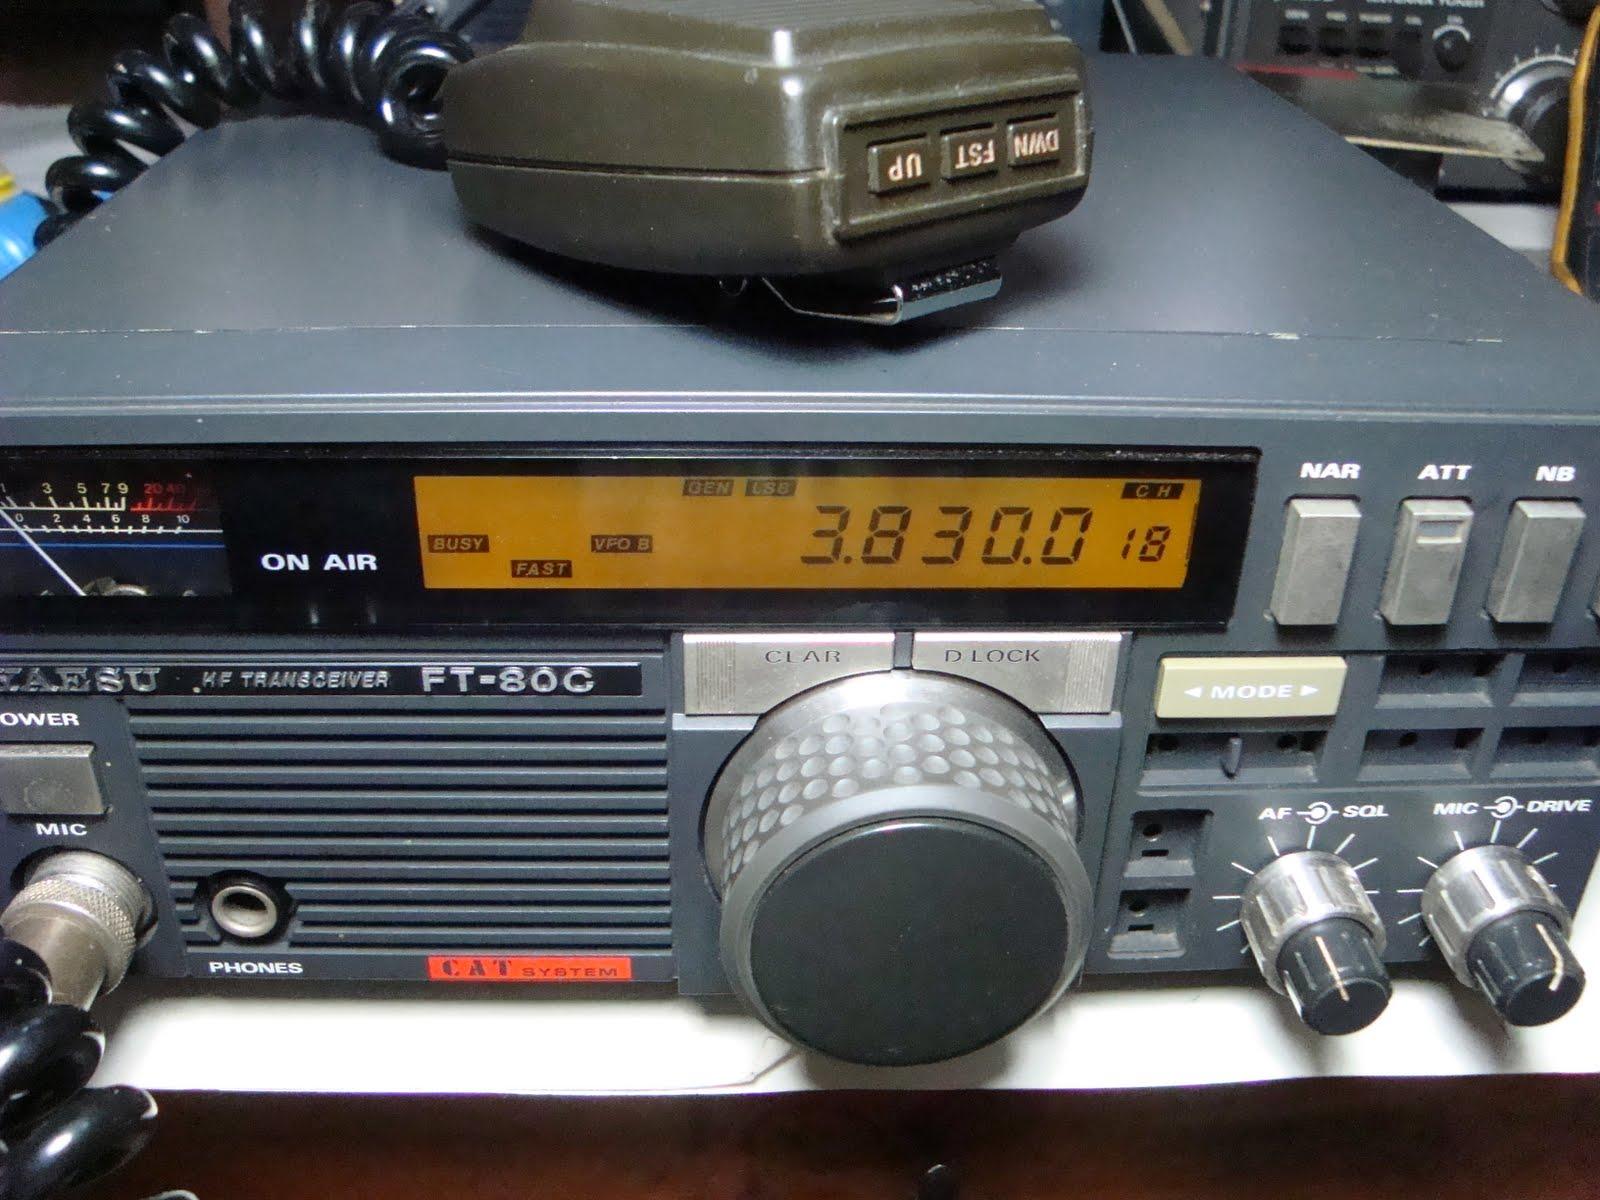 radio seller ft 80c hf transceiver 200 watt sold. Black Bedroom Furniture Sets. Home Design Ideas